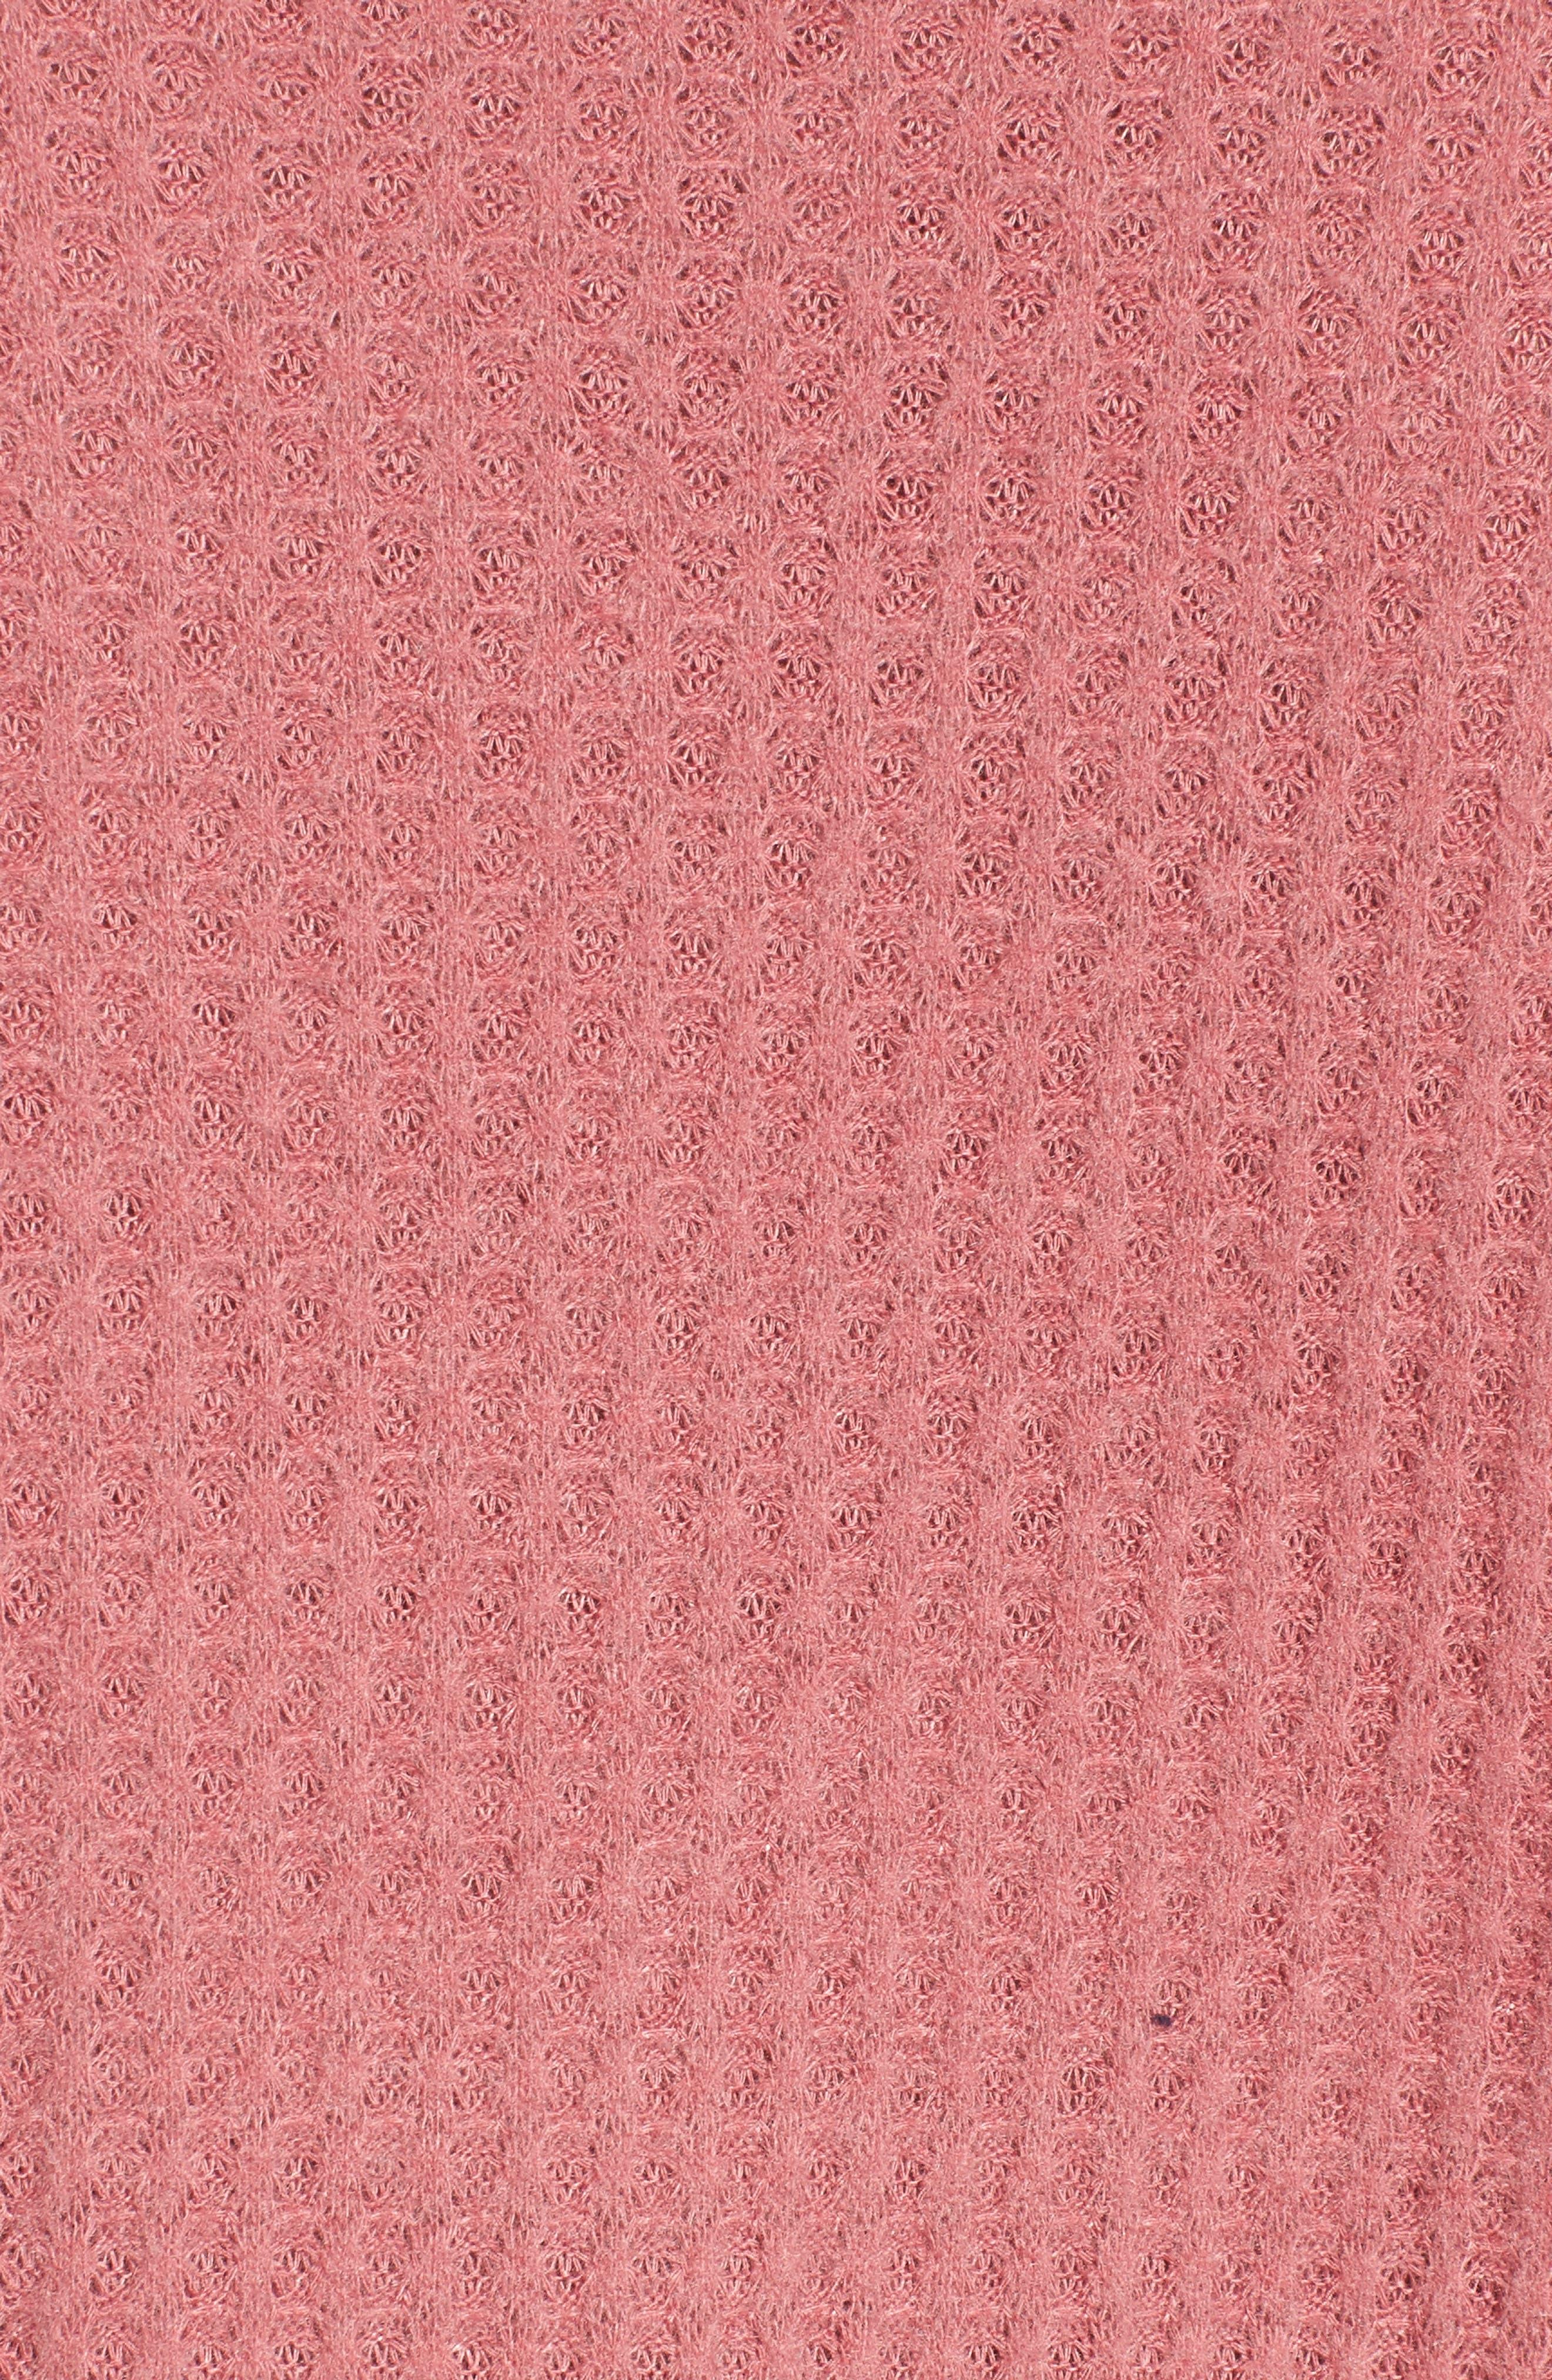 Thermal Crop Top,                             Alternate thumbnail 5, color,                             Velvet Blush